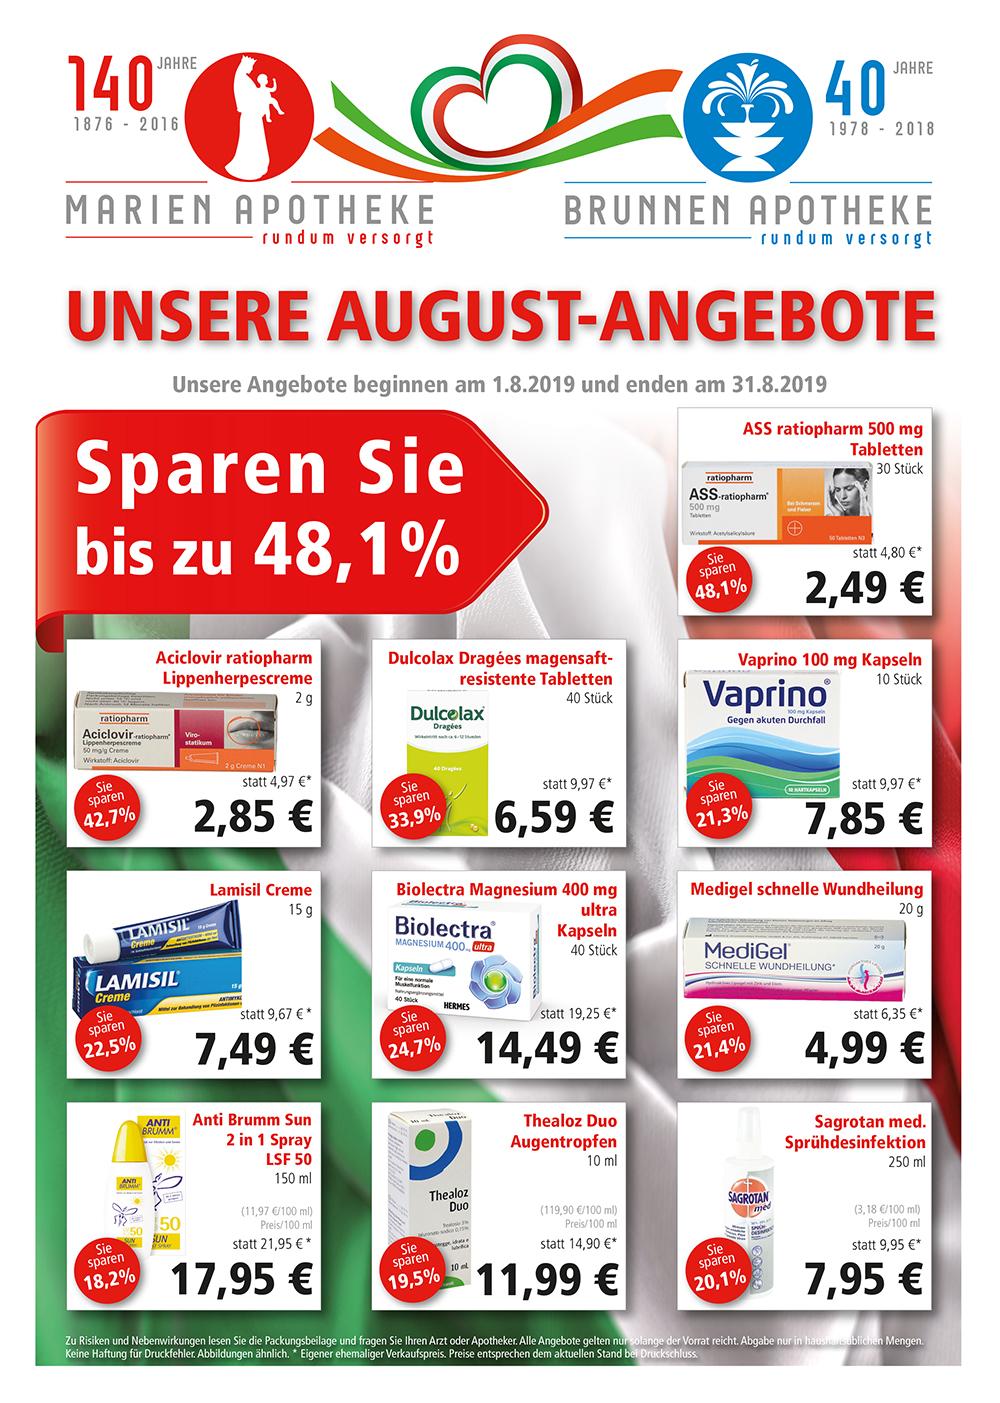 http://www.apotheken.de/fileadmin/clubarea/00000-Angebote/59387_marien_angebot_1.jpg